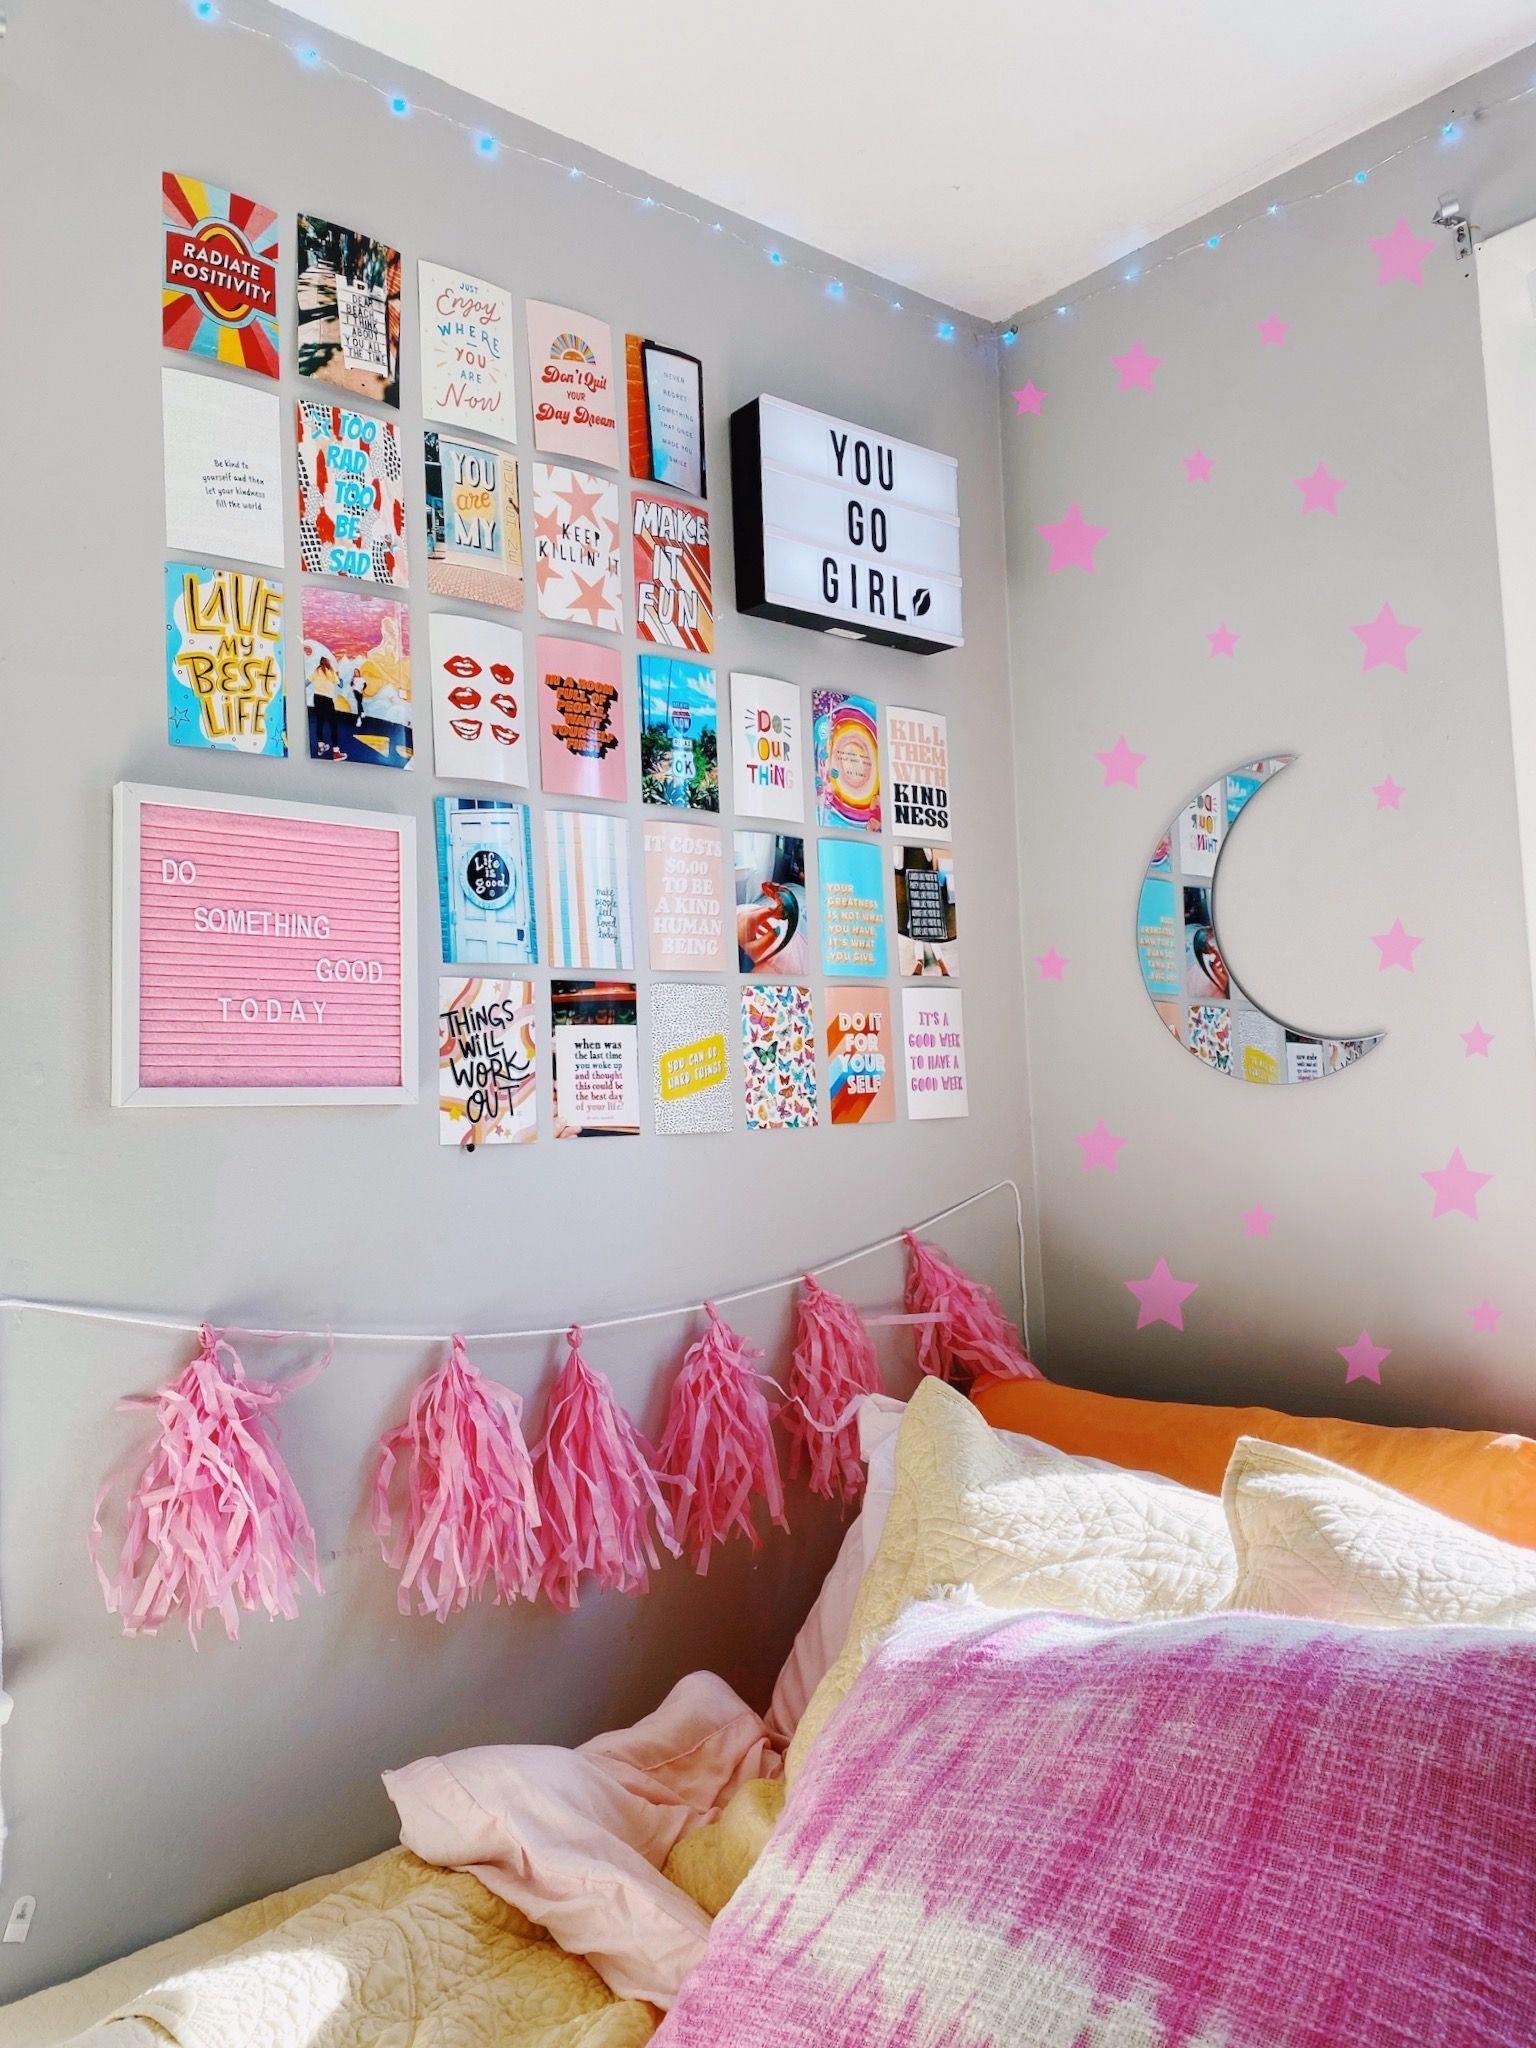 caitysprints on etsy!! { #bedroom #vsco #roomgoals #dorm #dormroom #wallart #walldecor #etsyshop #summer #positivevibes }